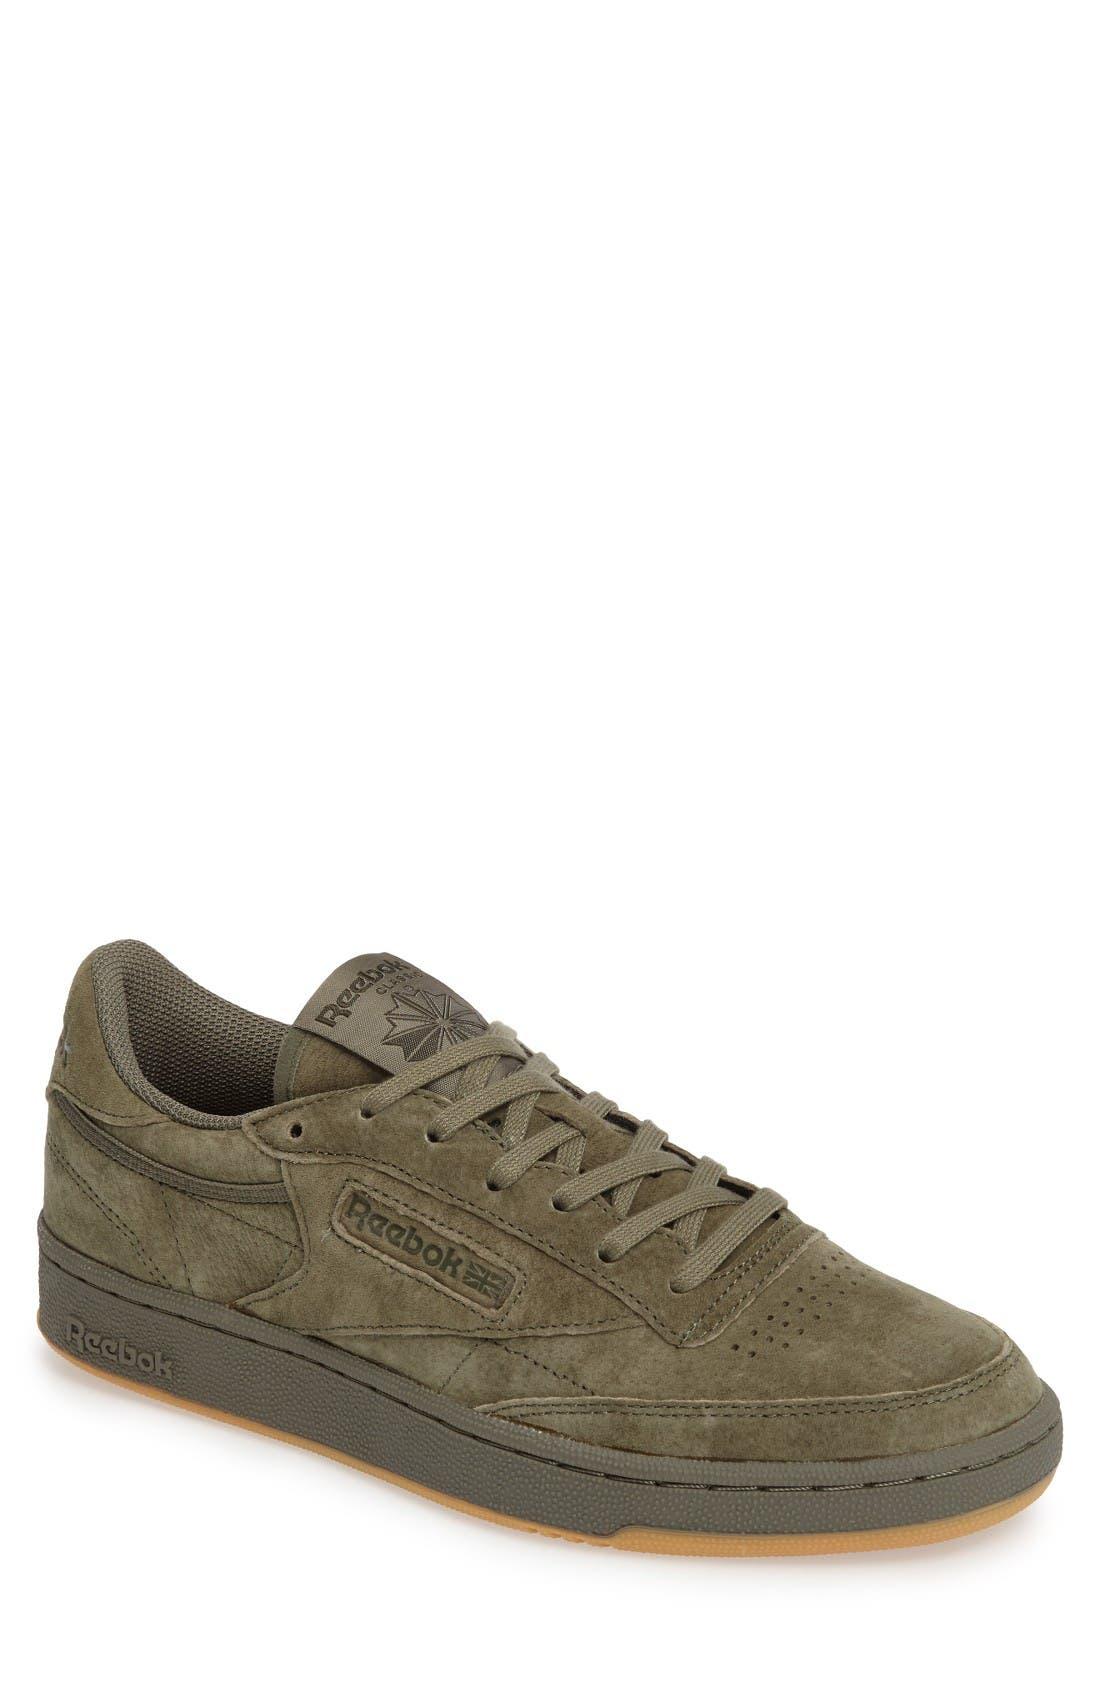 Reebok Club C 85 TG Sneaker (Men)